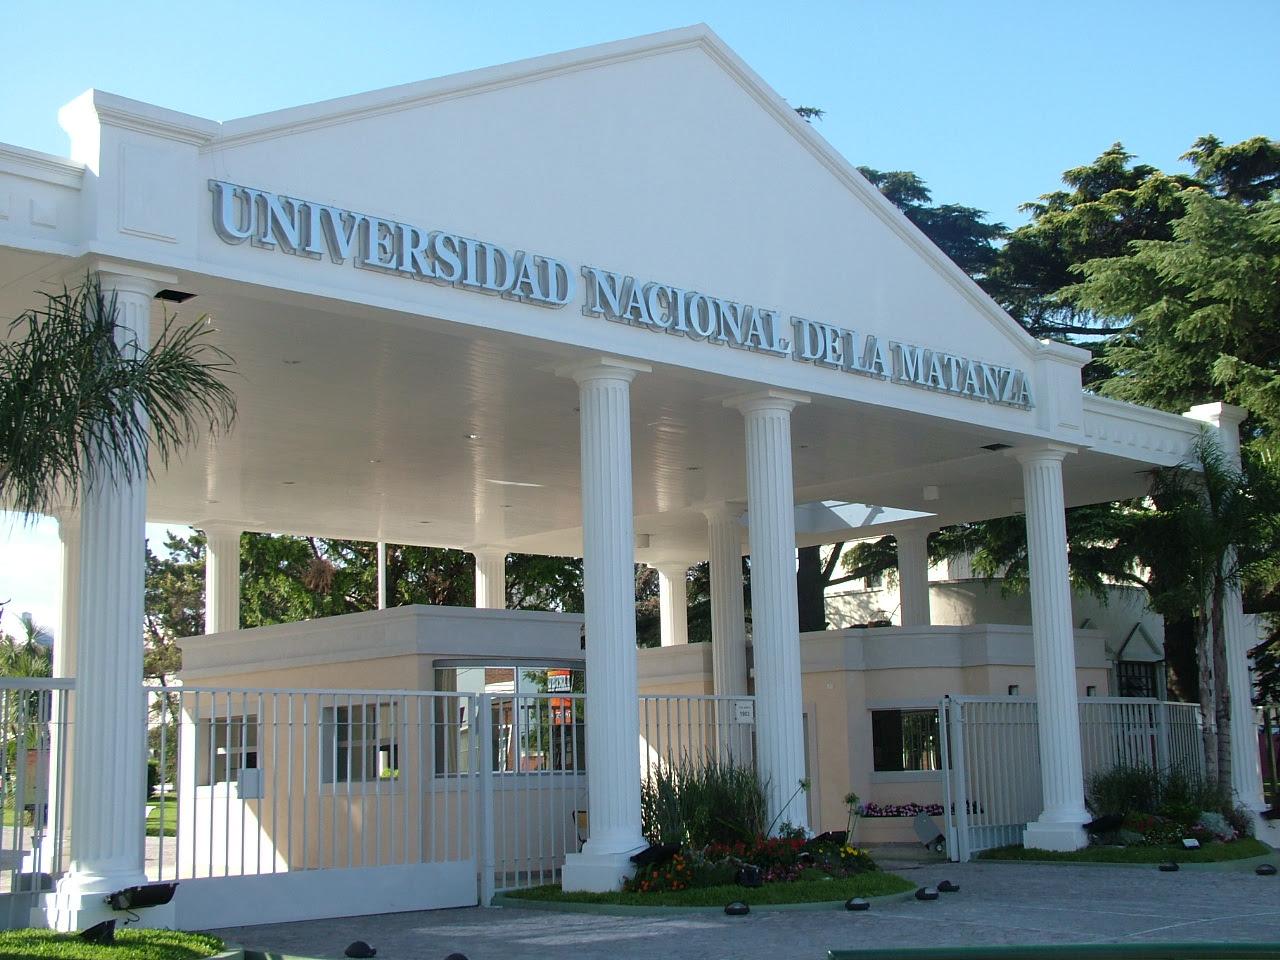 Universidade Nacional de La Matanza